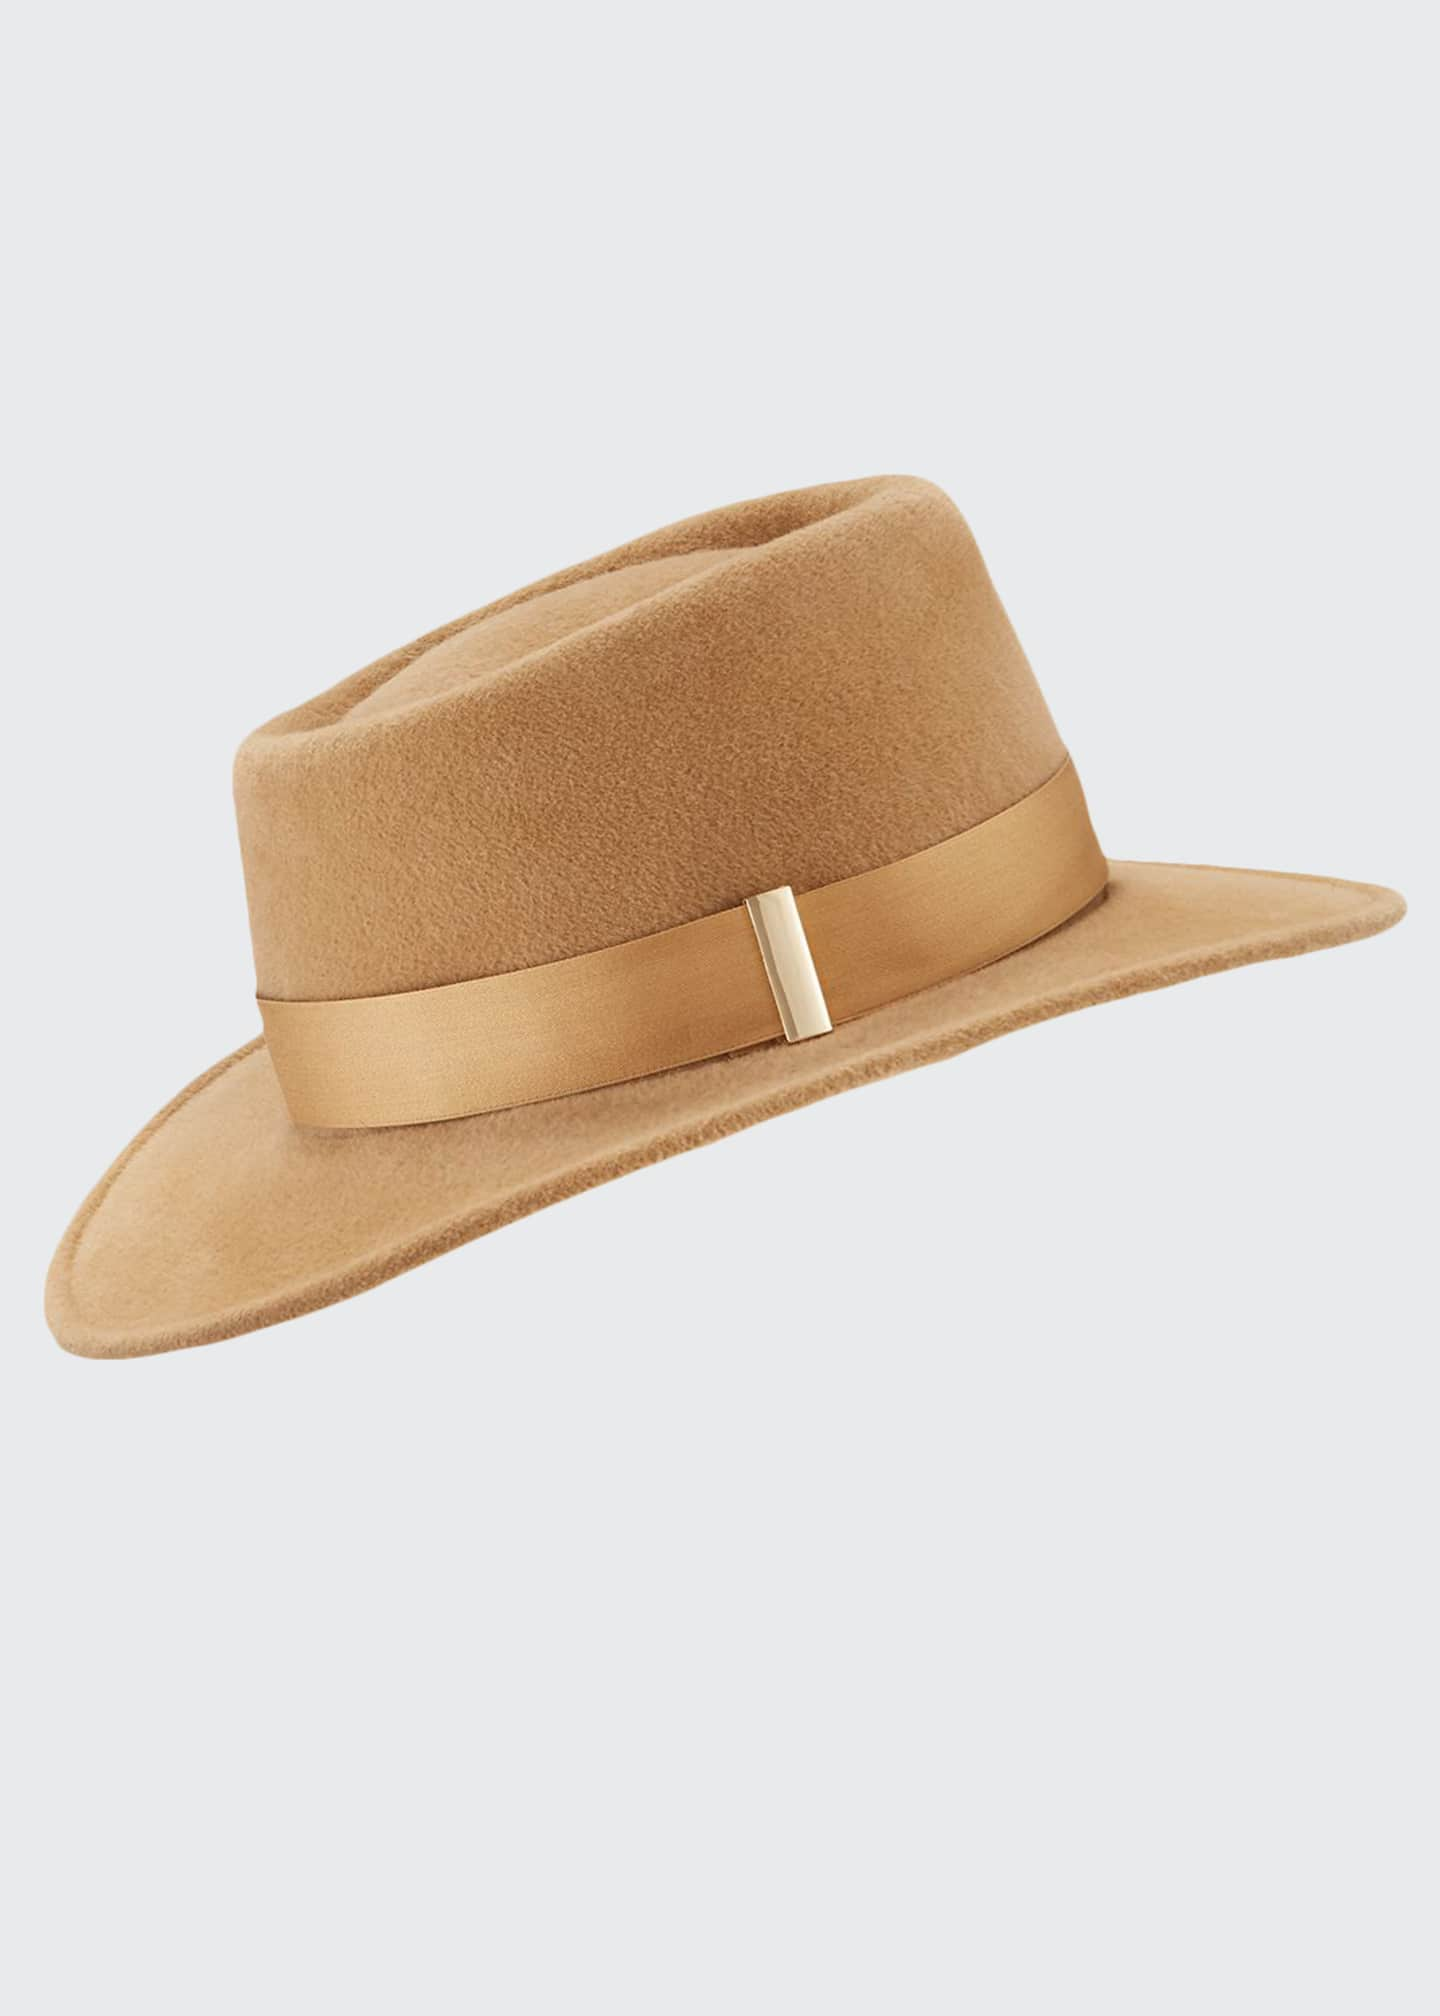 Gigi Burris Small Brim Rabbit Felt Fedora Hat